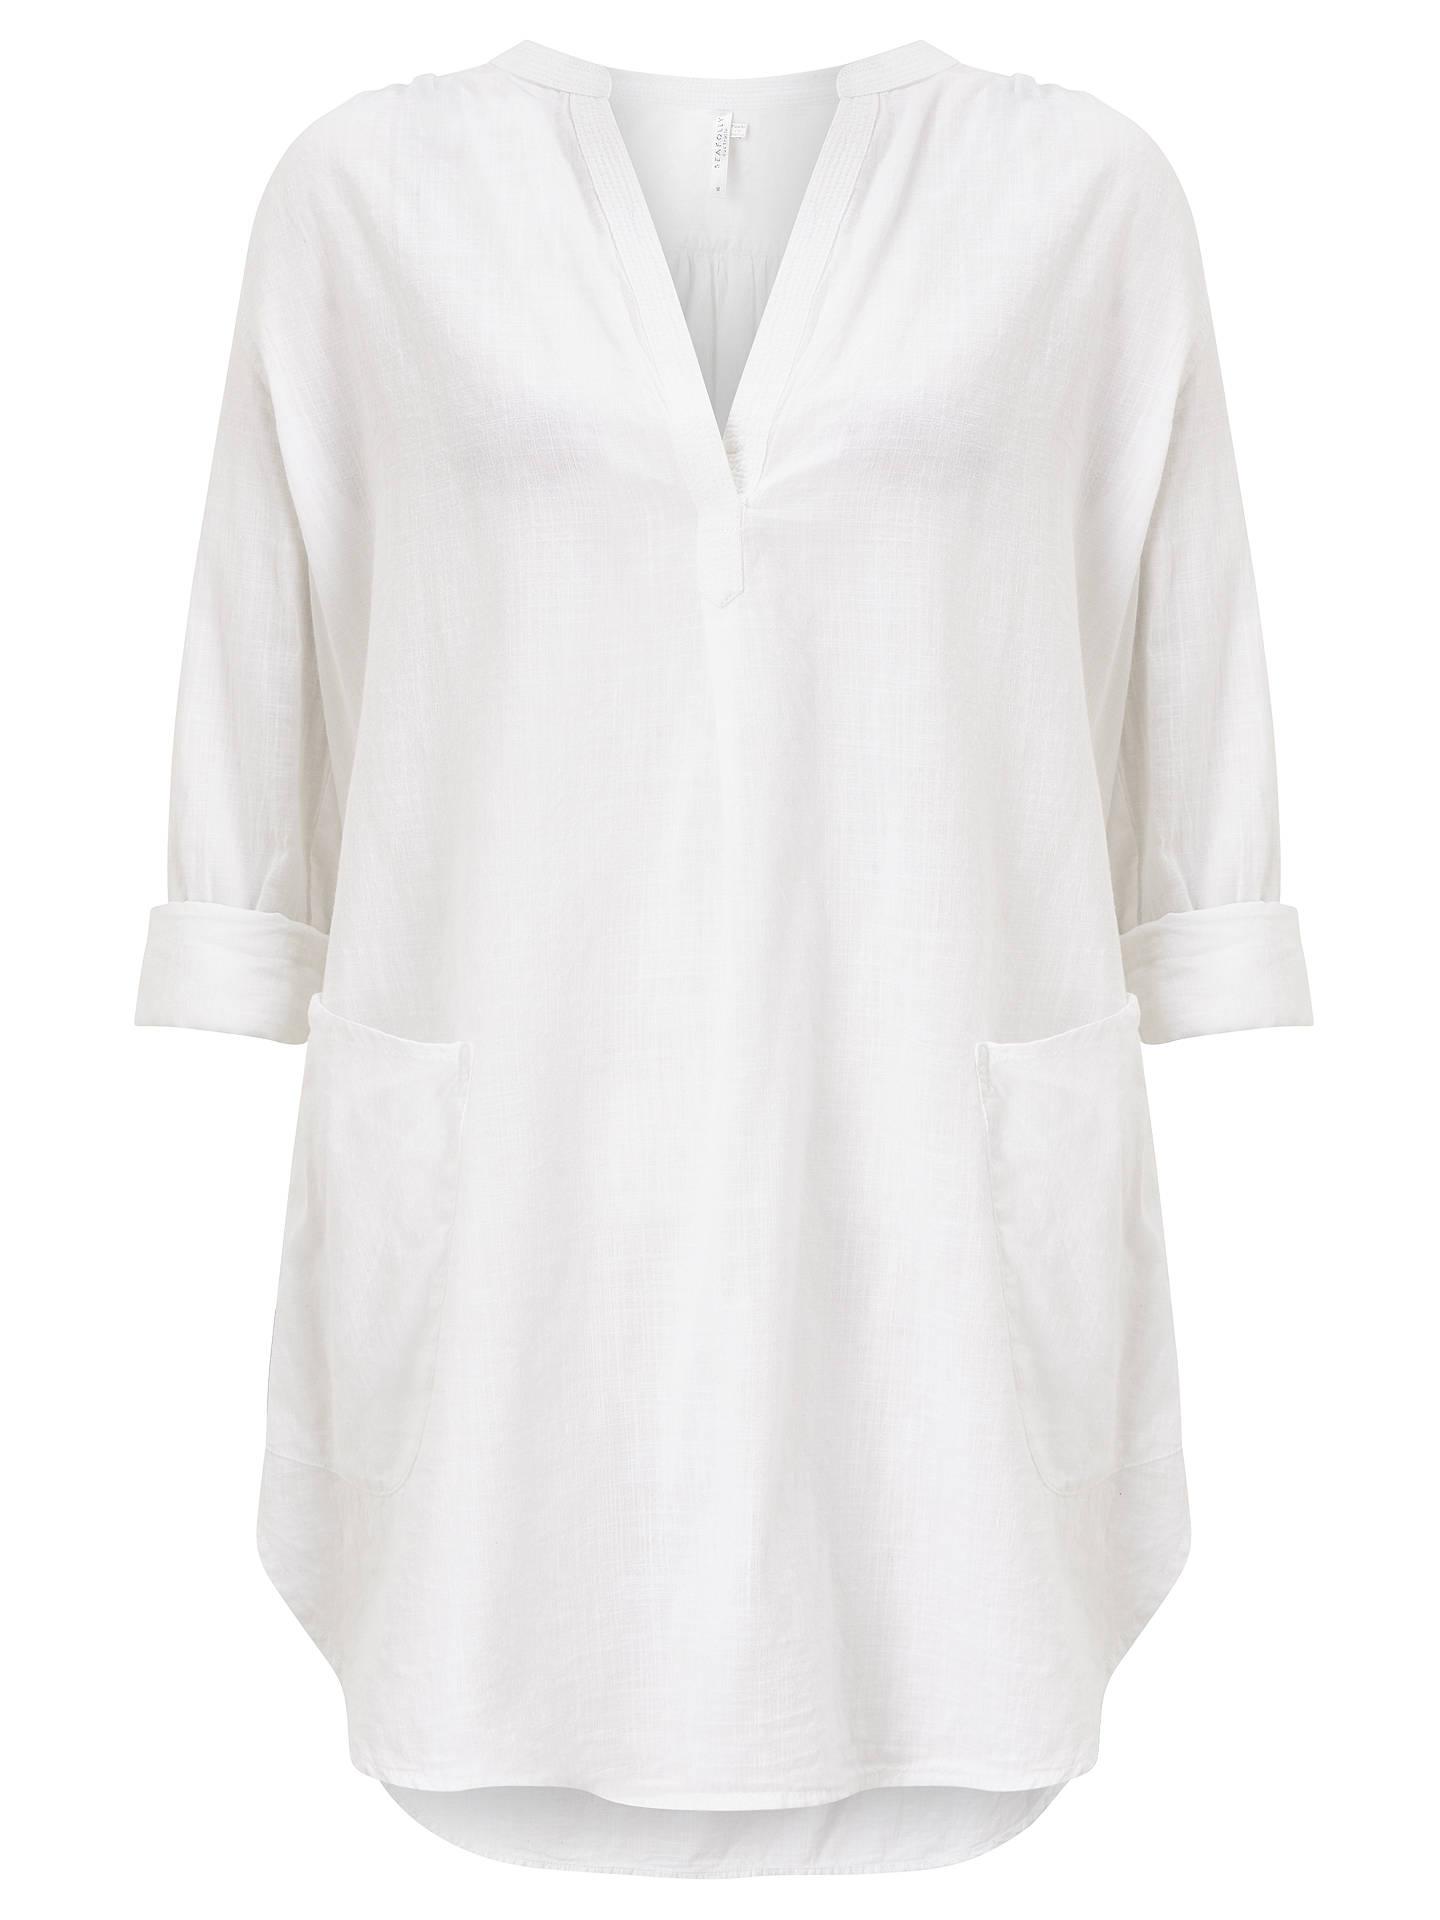 c45a66bac7 ... Buy Seafolly Boyfriend Beach Shirt, White, S Online at johnlewis.com